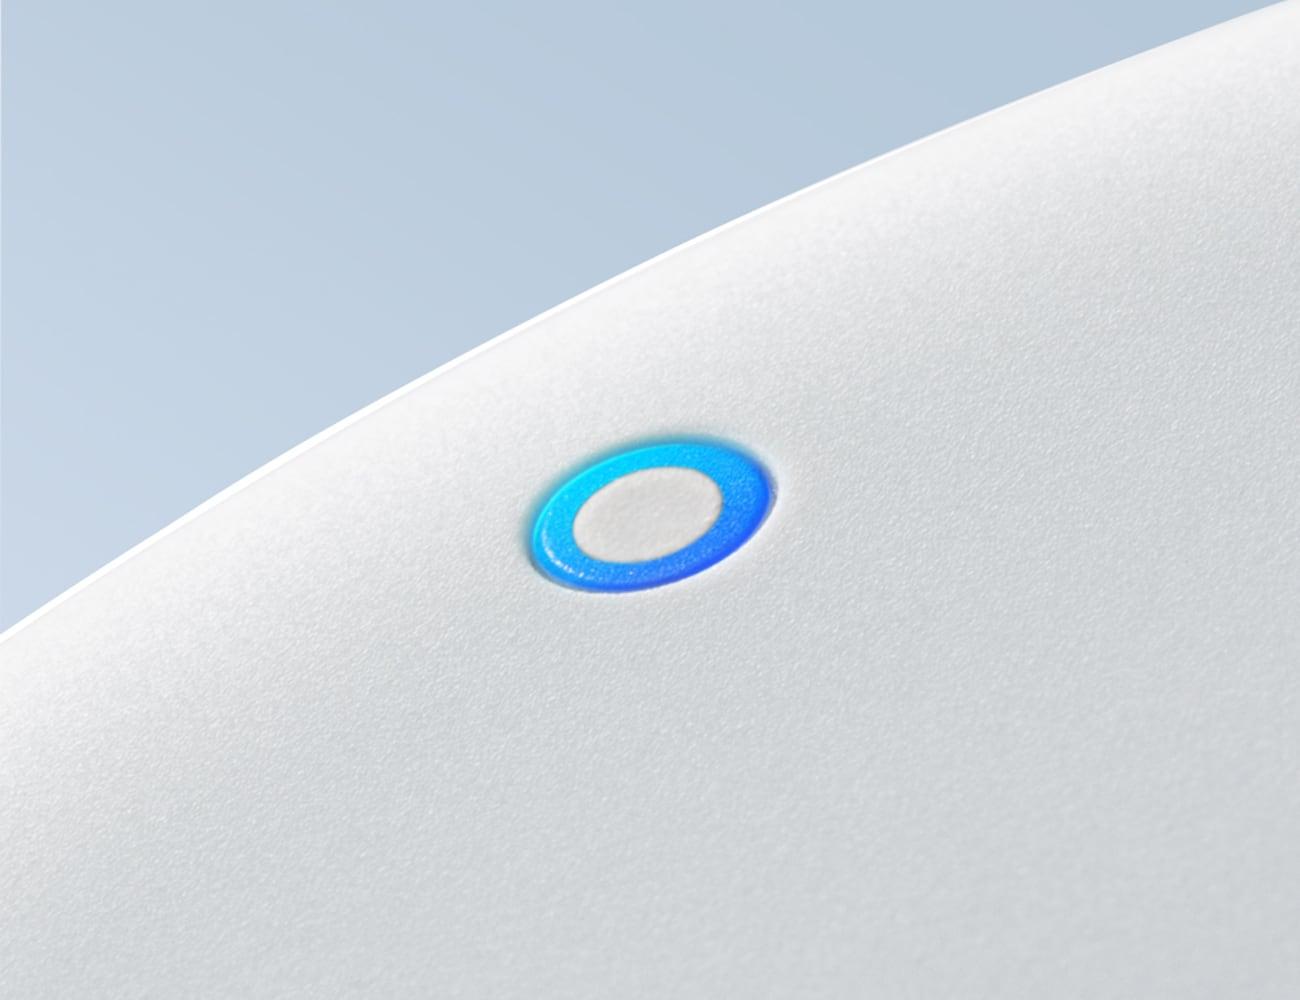 Anker PowerWave Wireless Charging Pad